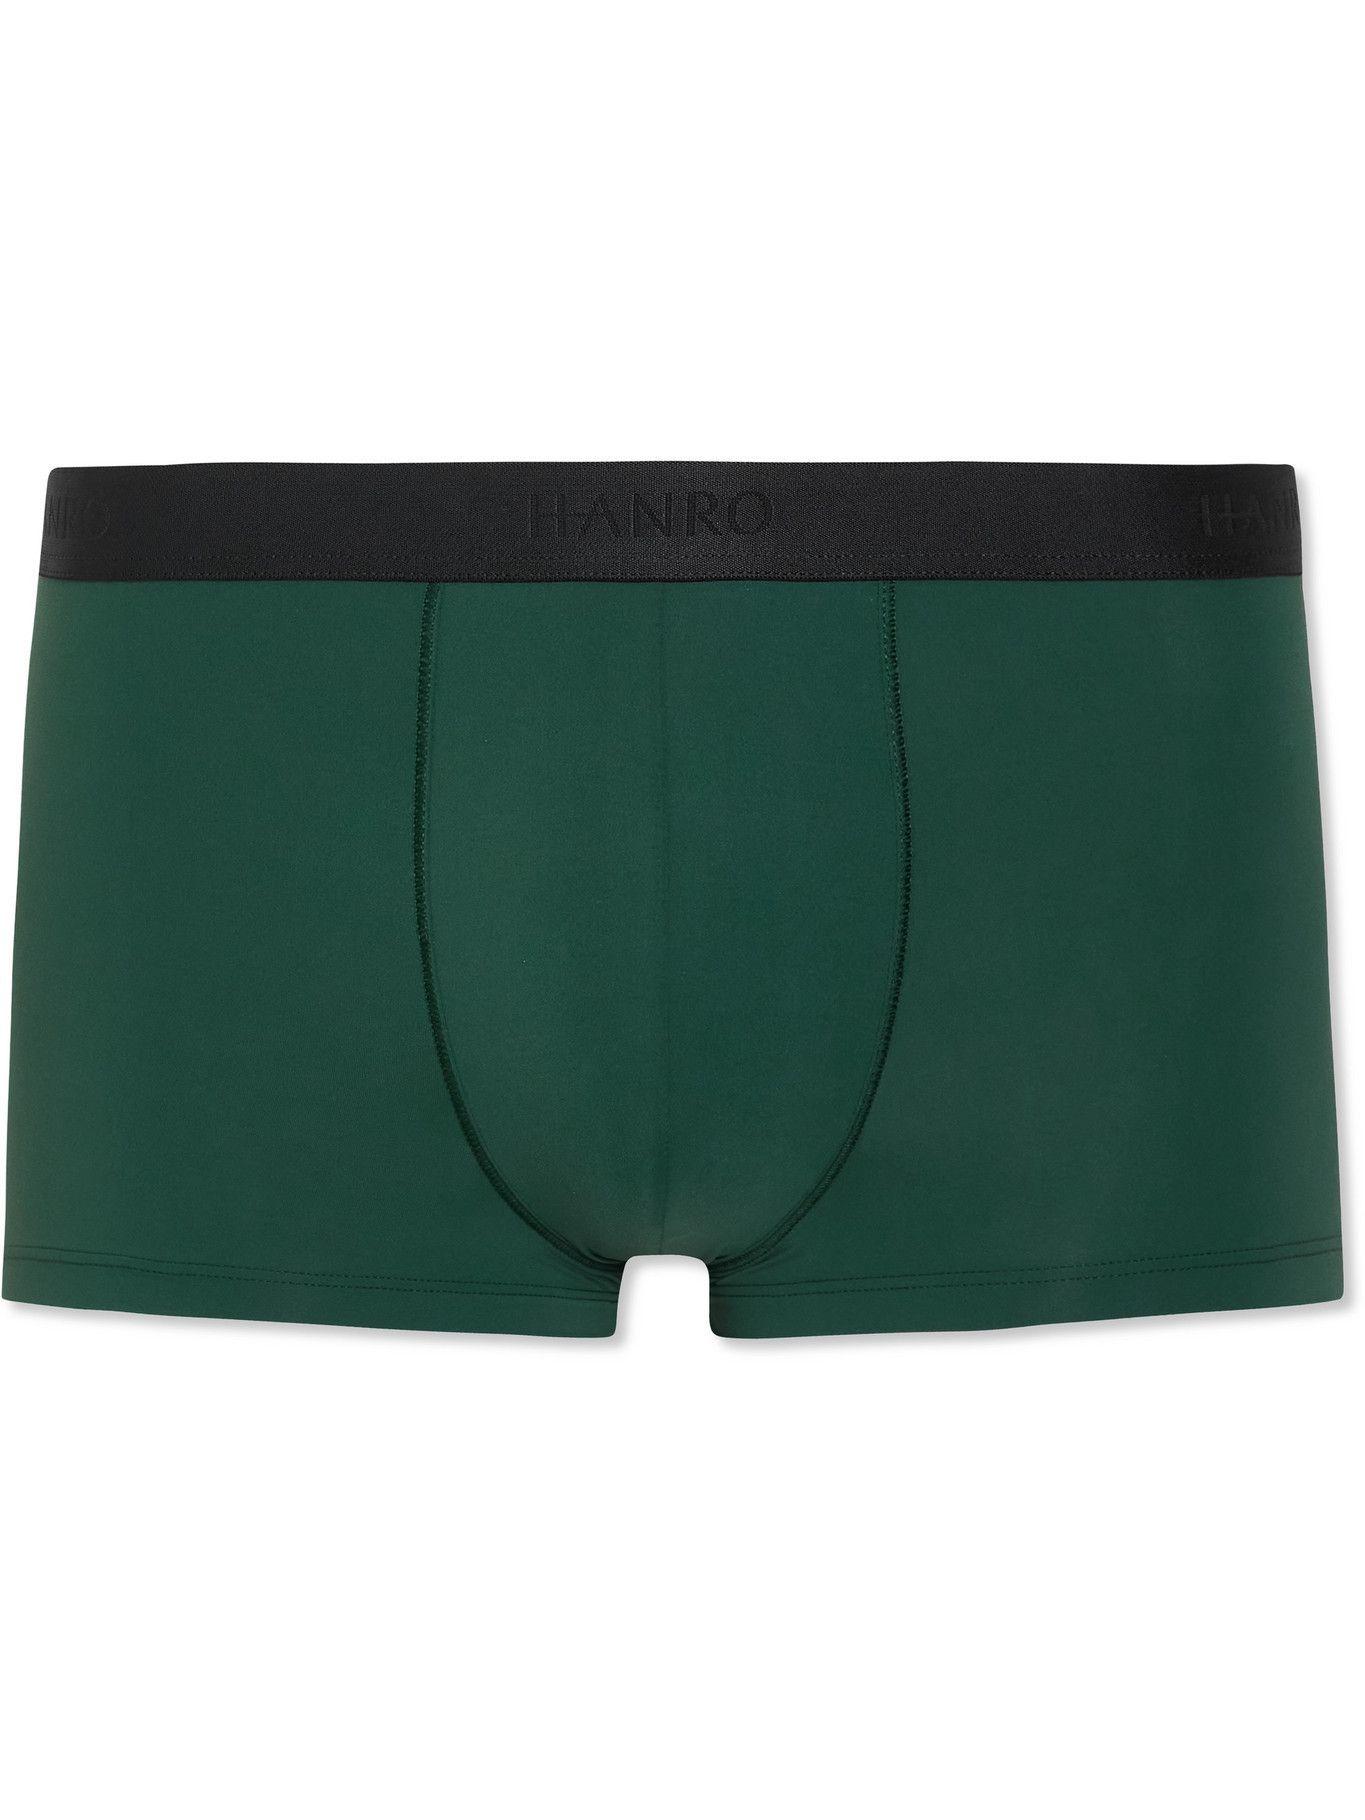 Hanro - Stretch-Jersey Boxer Briefs - Green